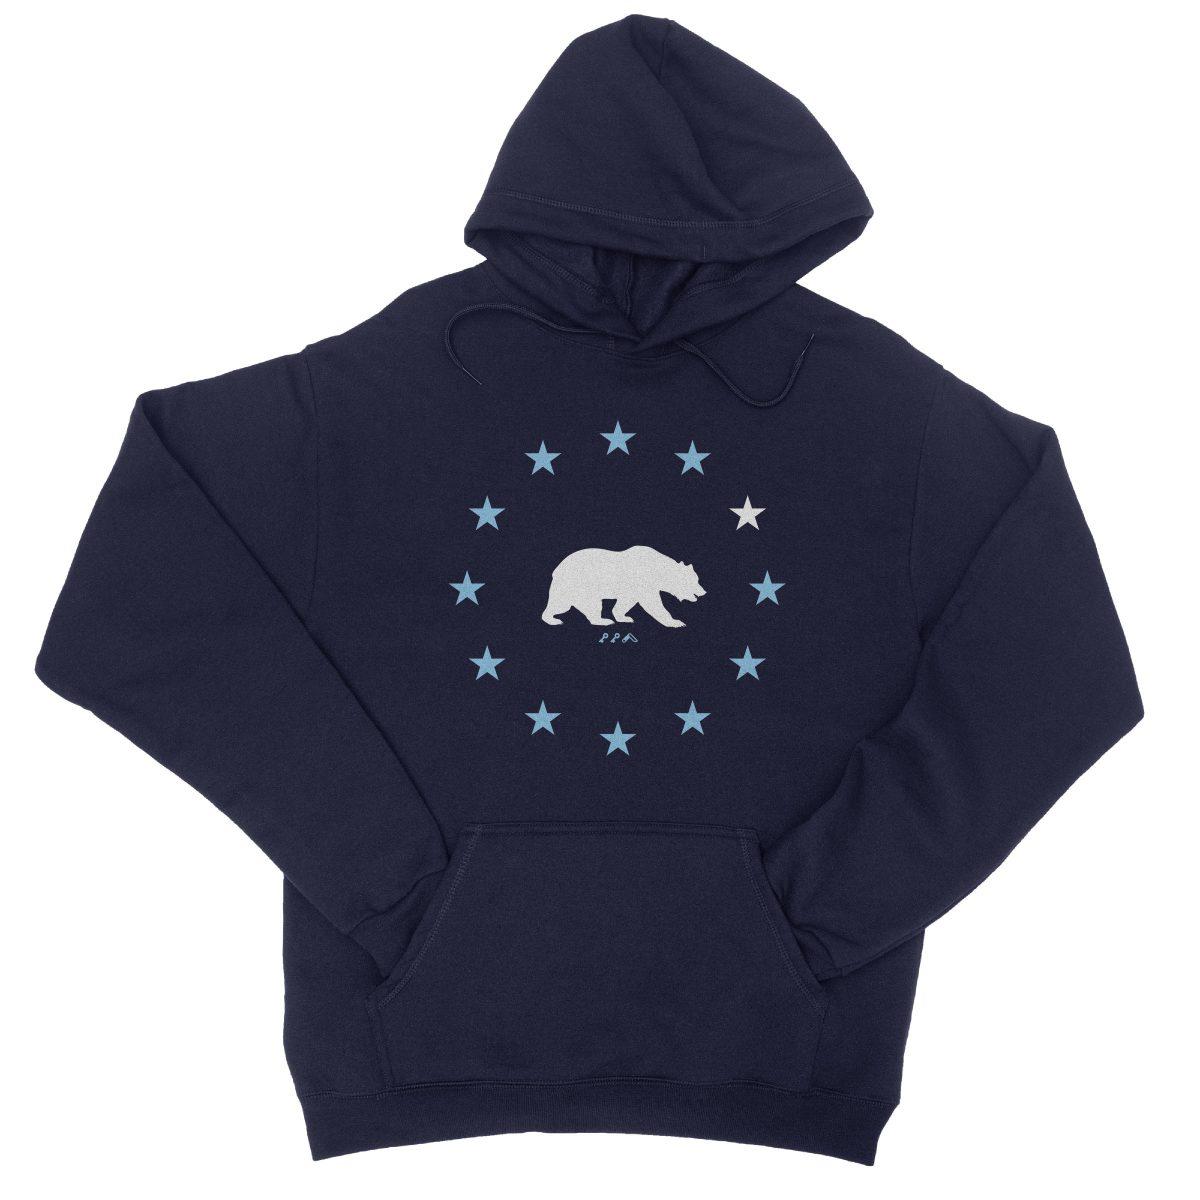 STAR GAZING california republic cali bear hoodie in navy by kikicutt